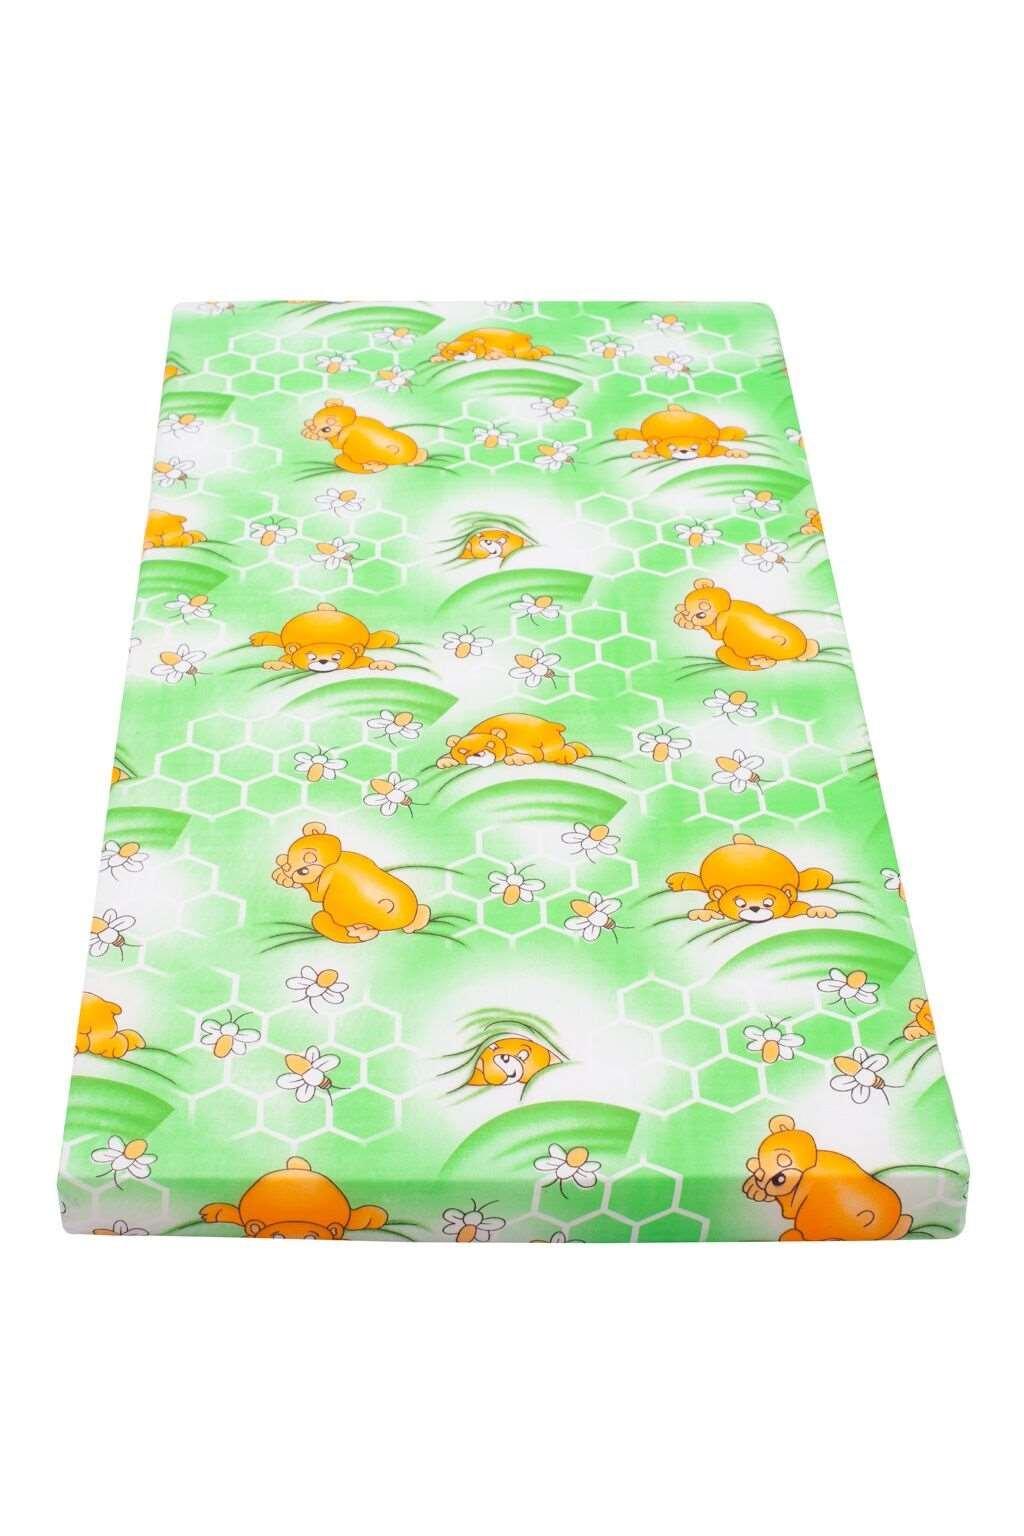 Detský matrac New Baby 120x60 molitan-kokos zelený obrázky